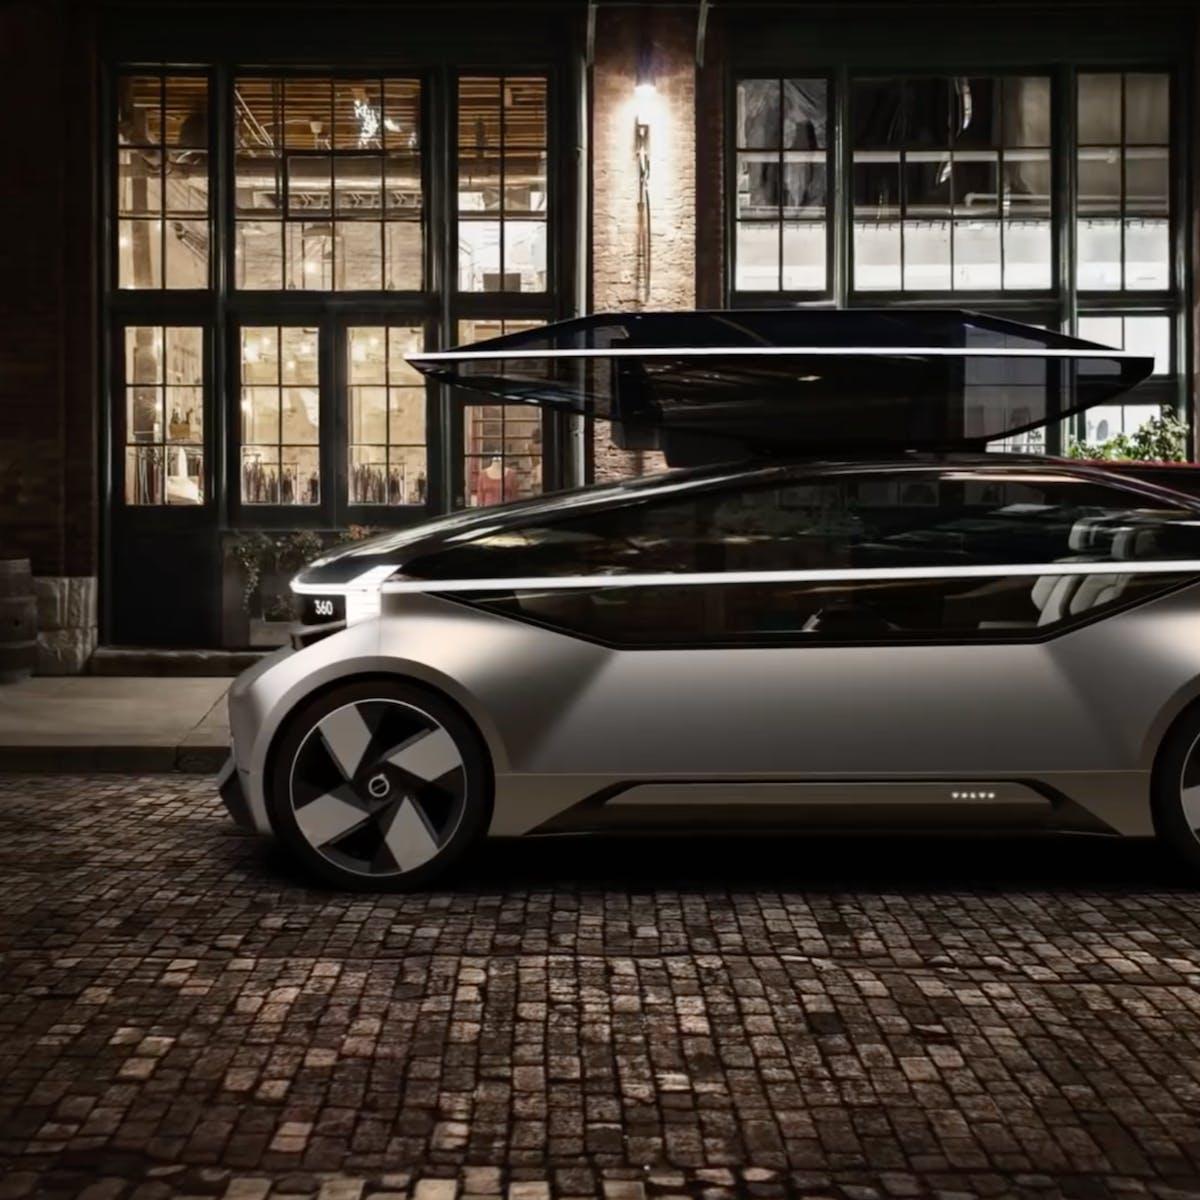 Video of Volvo Autonomous Driving Bed Concept Shows Self-Driving Car Plans